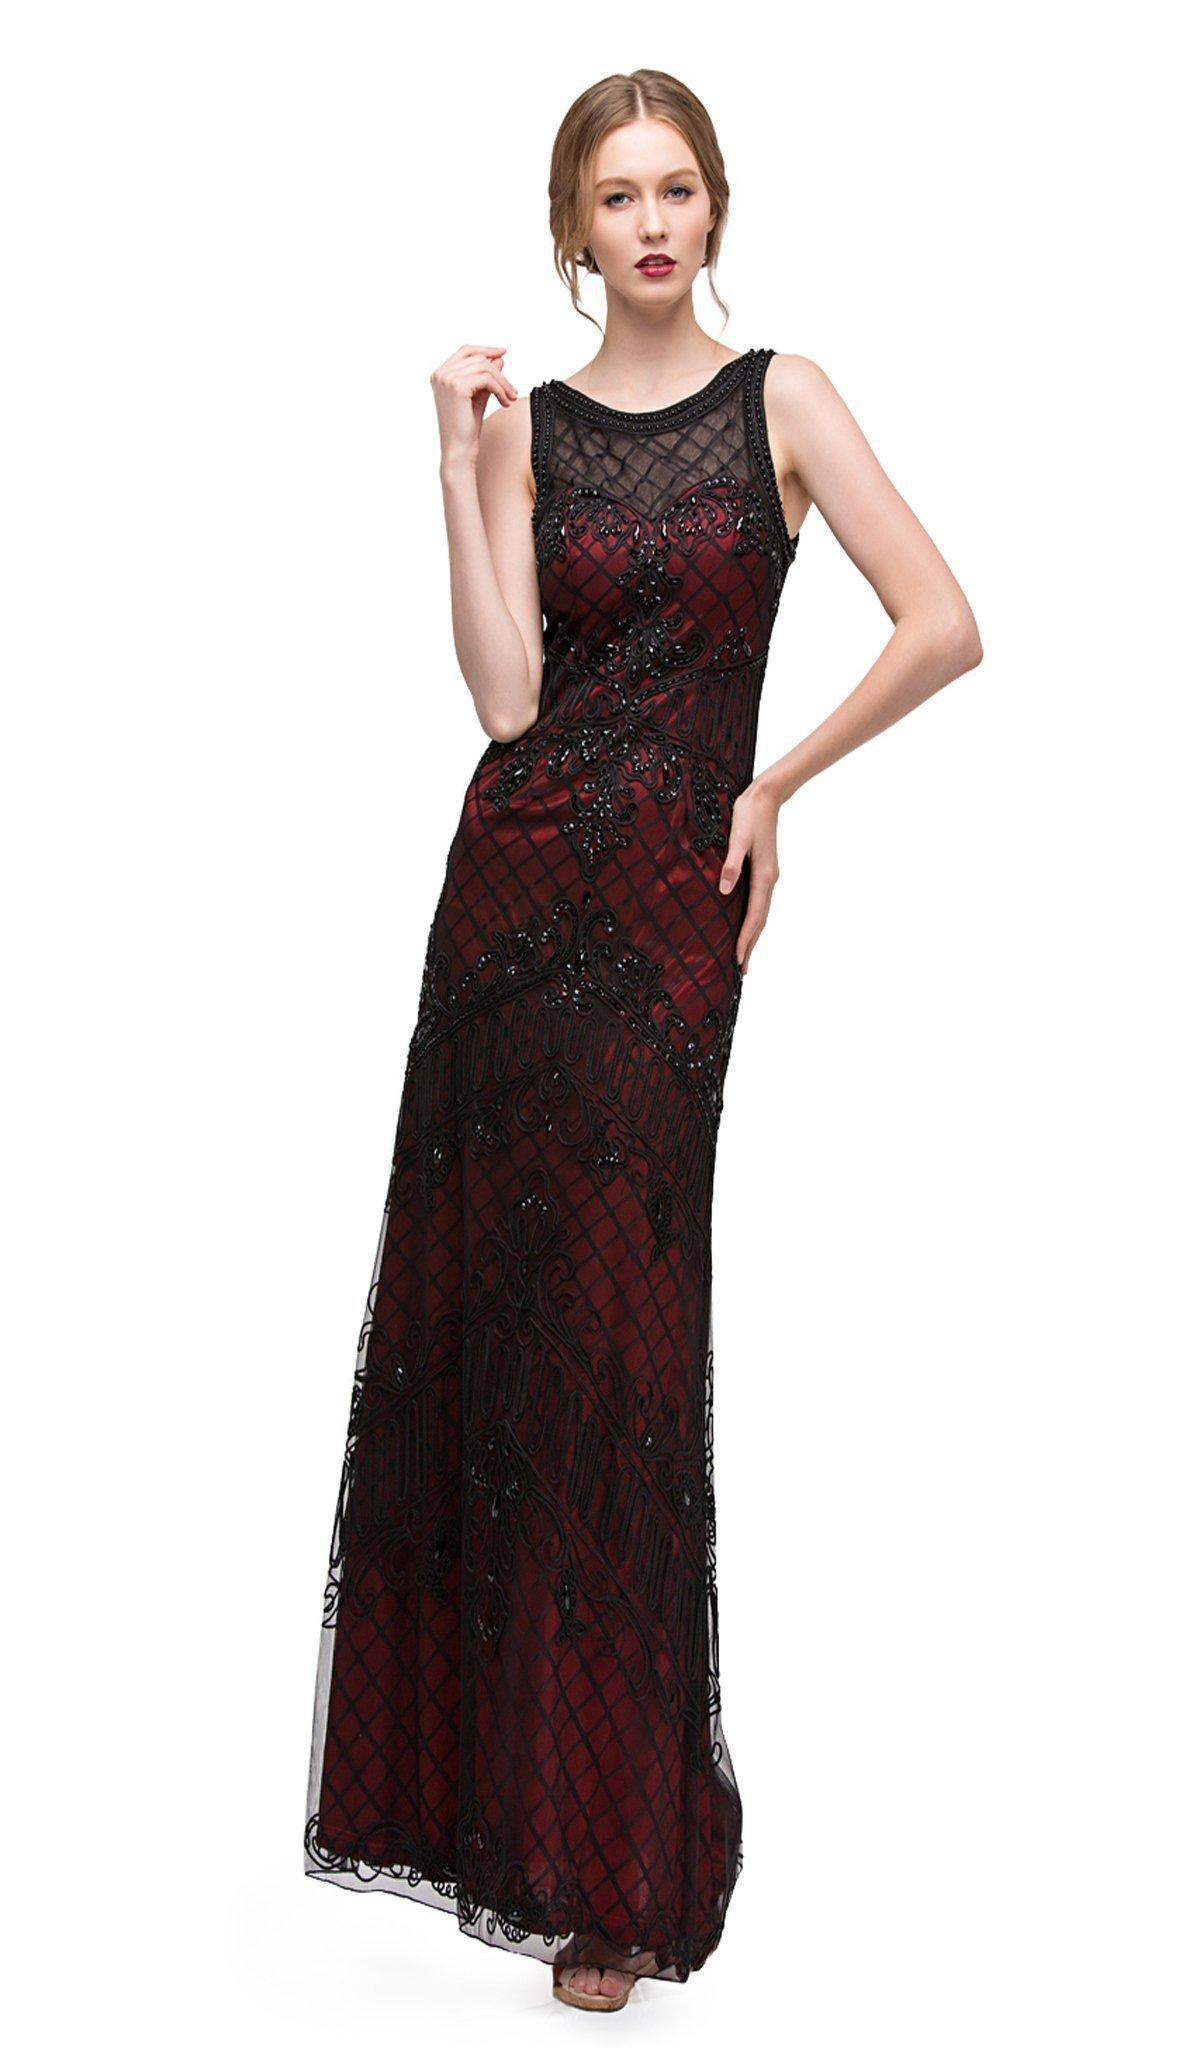 Eureka Fashion - Lattice Motif Illusion Bateau Soutache Evening Gown